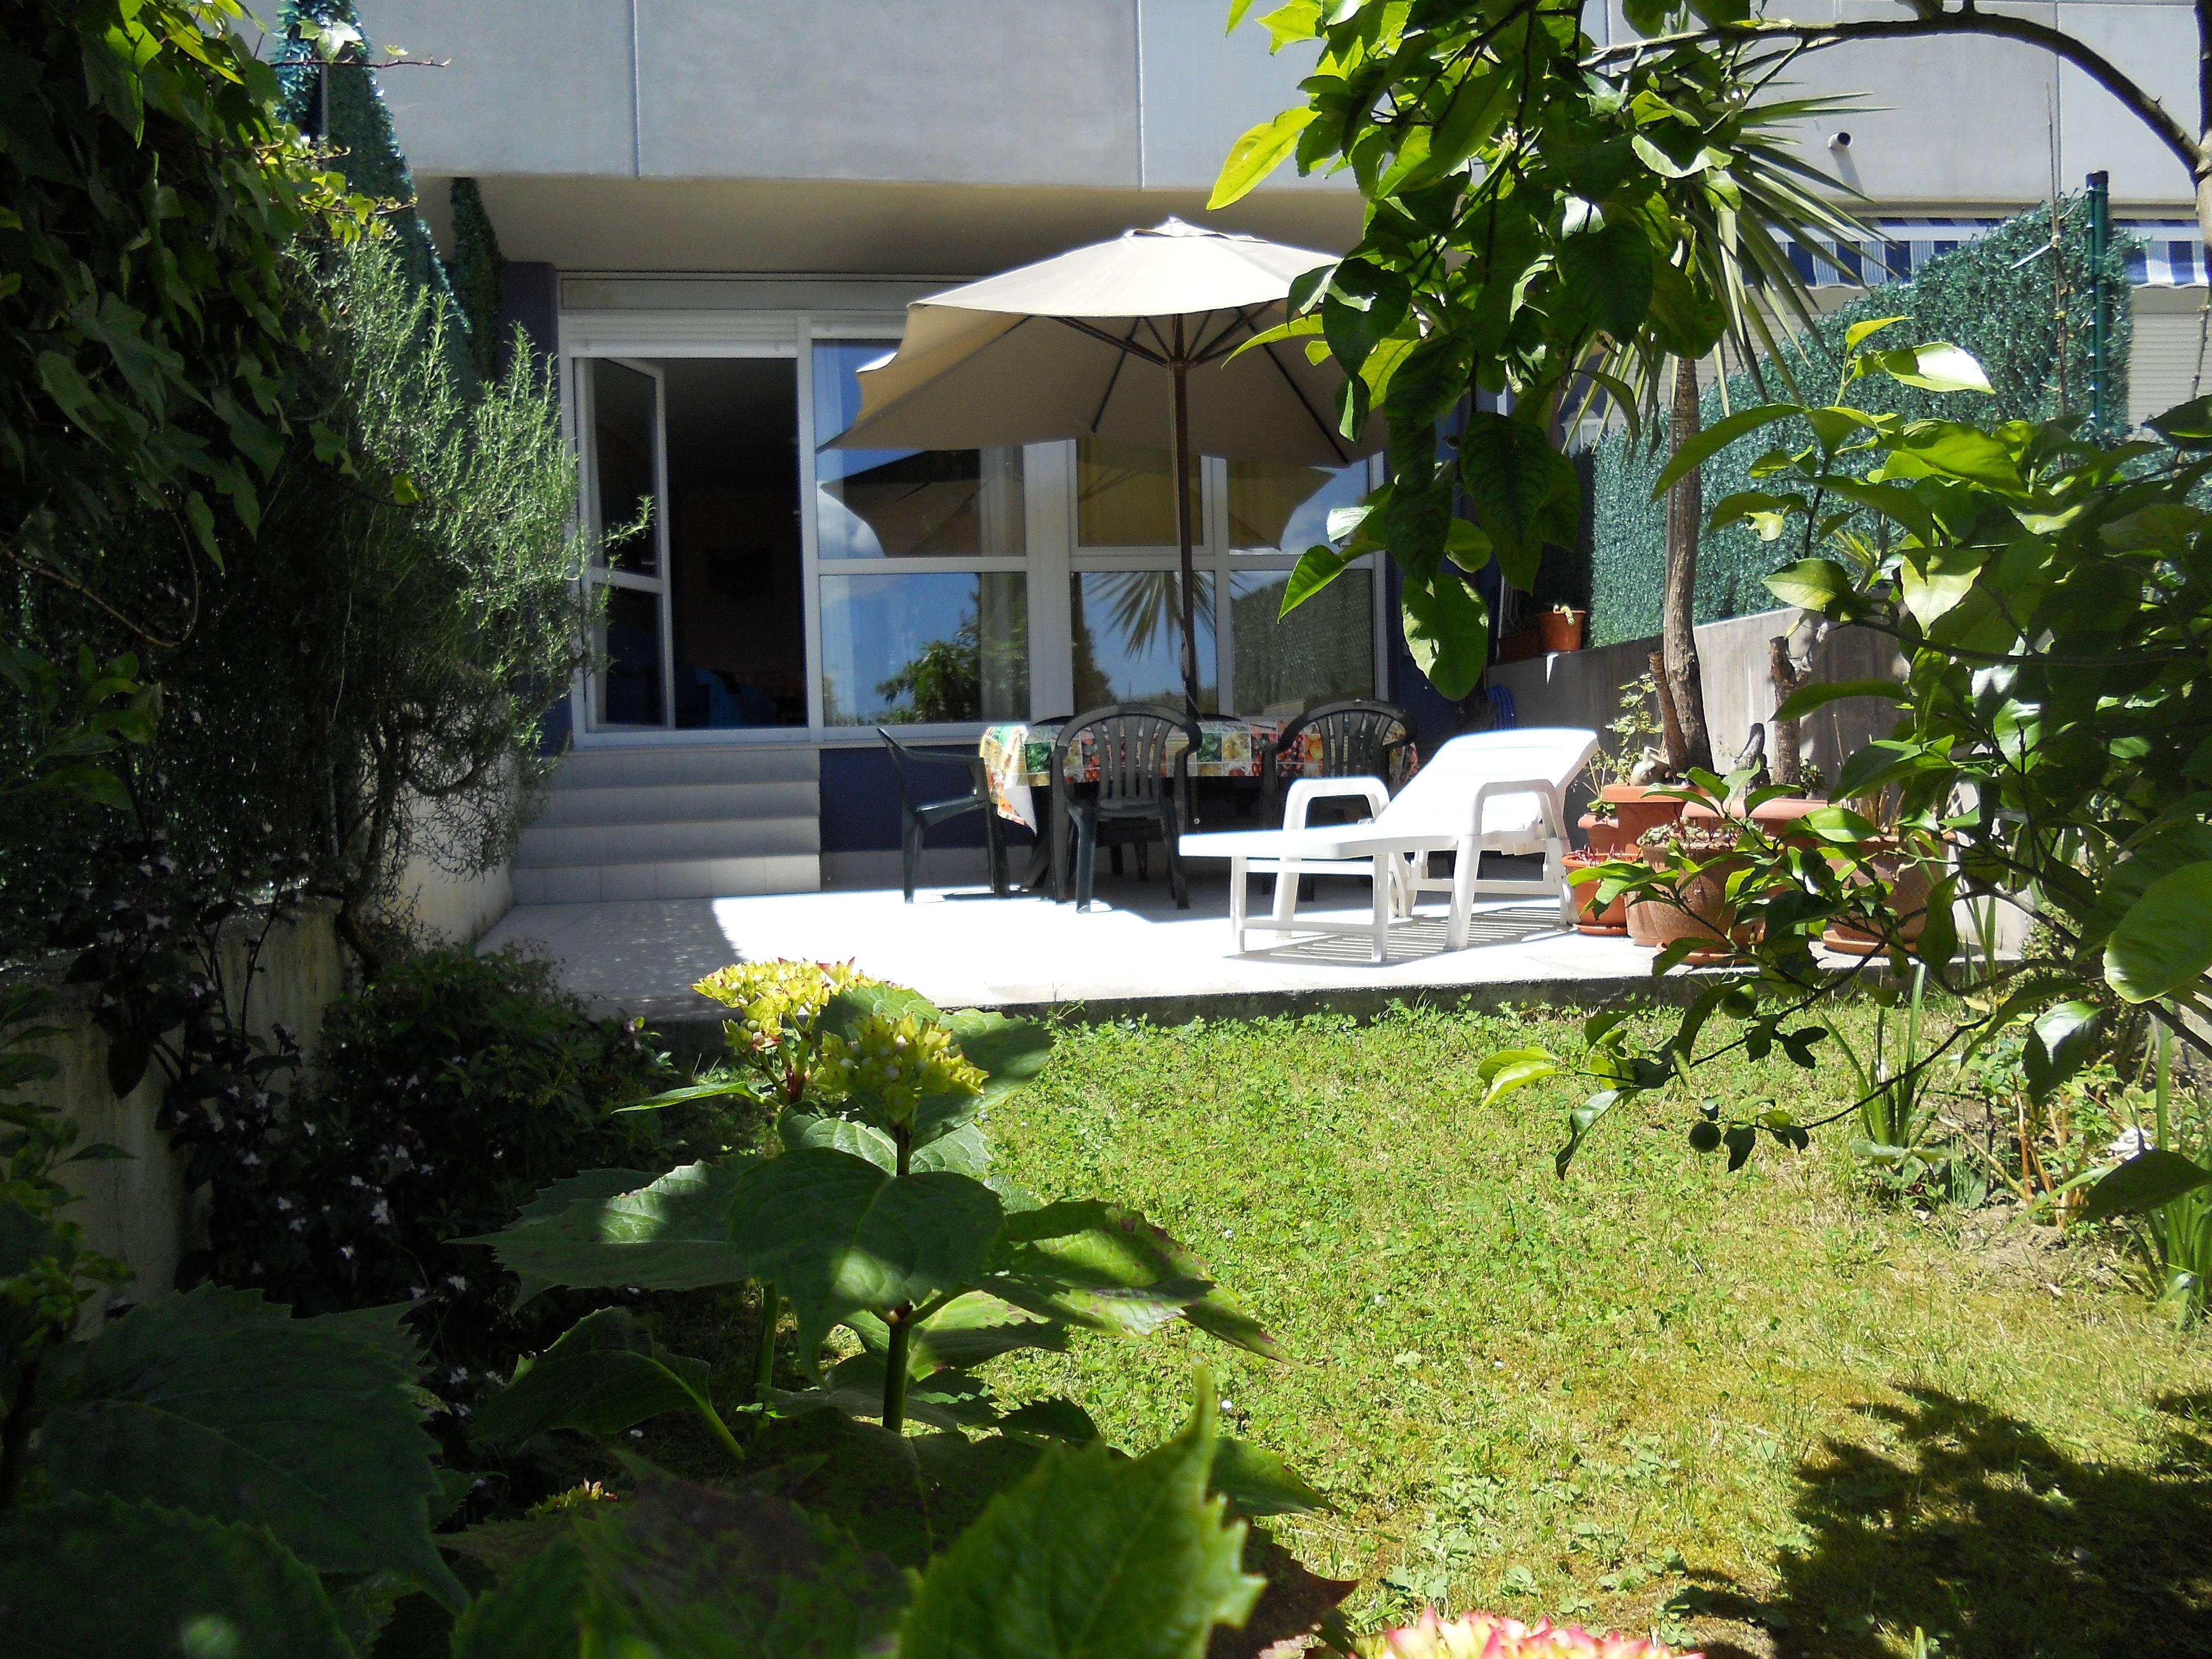 rez de jardin 6 pers 200 mts plage ostende castro urdiales cantabrie chemin du nord. Black Bedroom Furniture Sets. Home Design Ideas